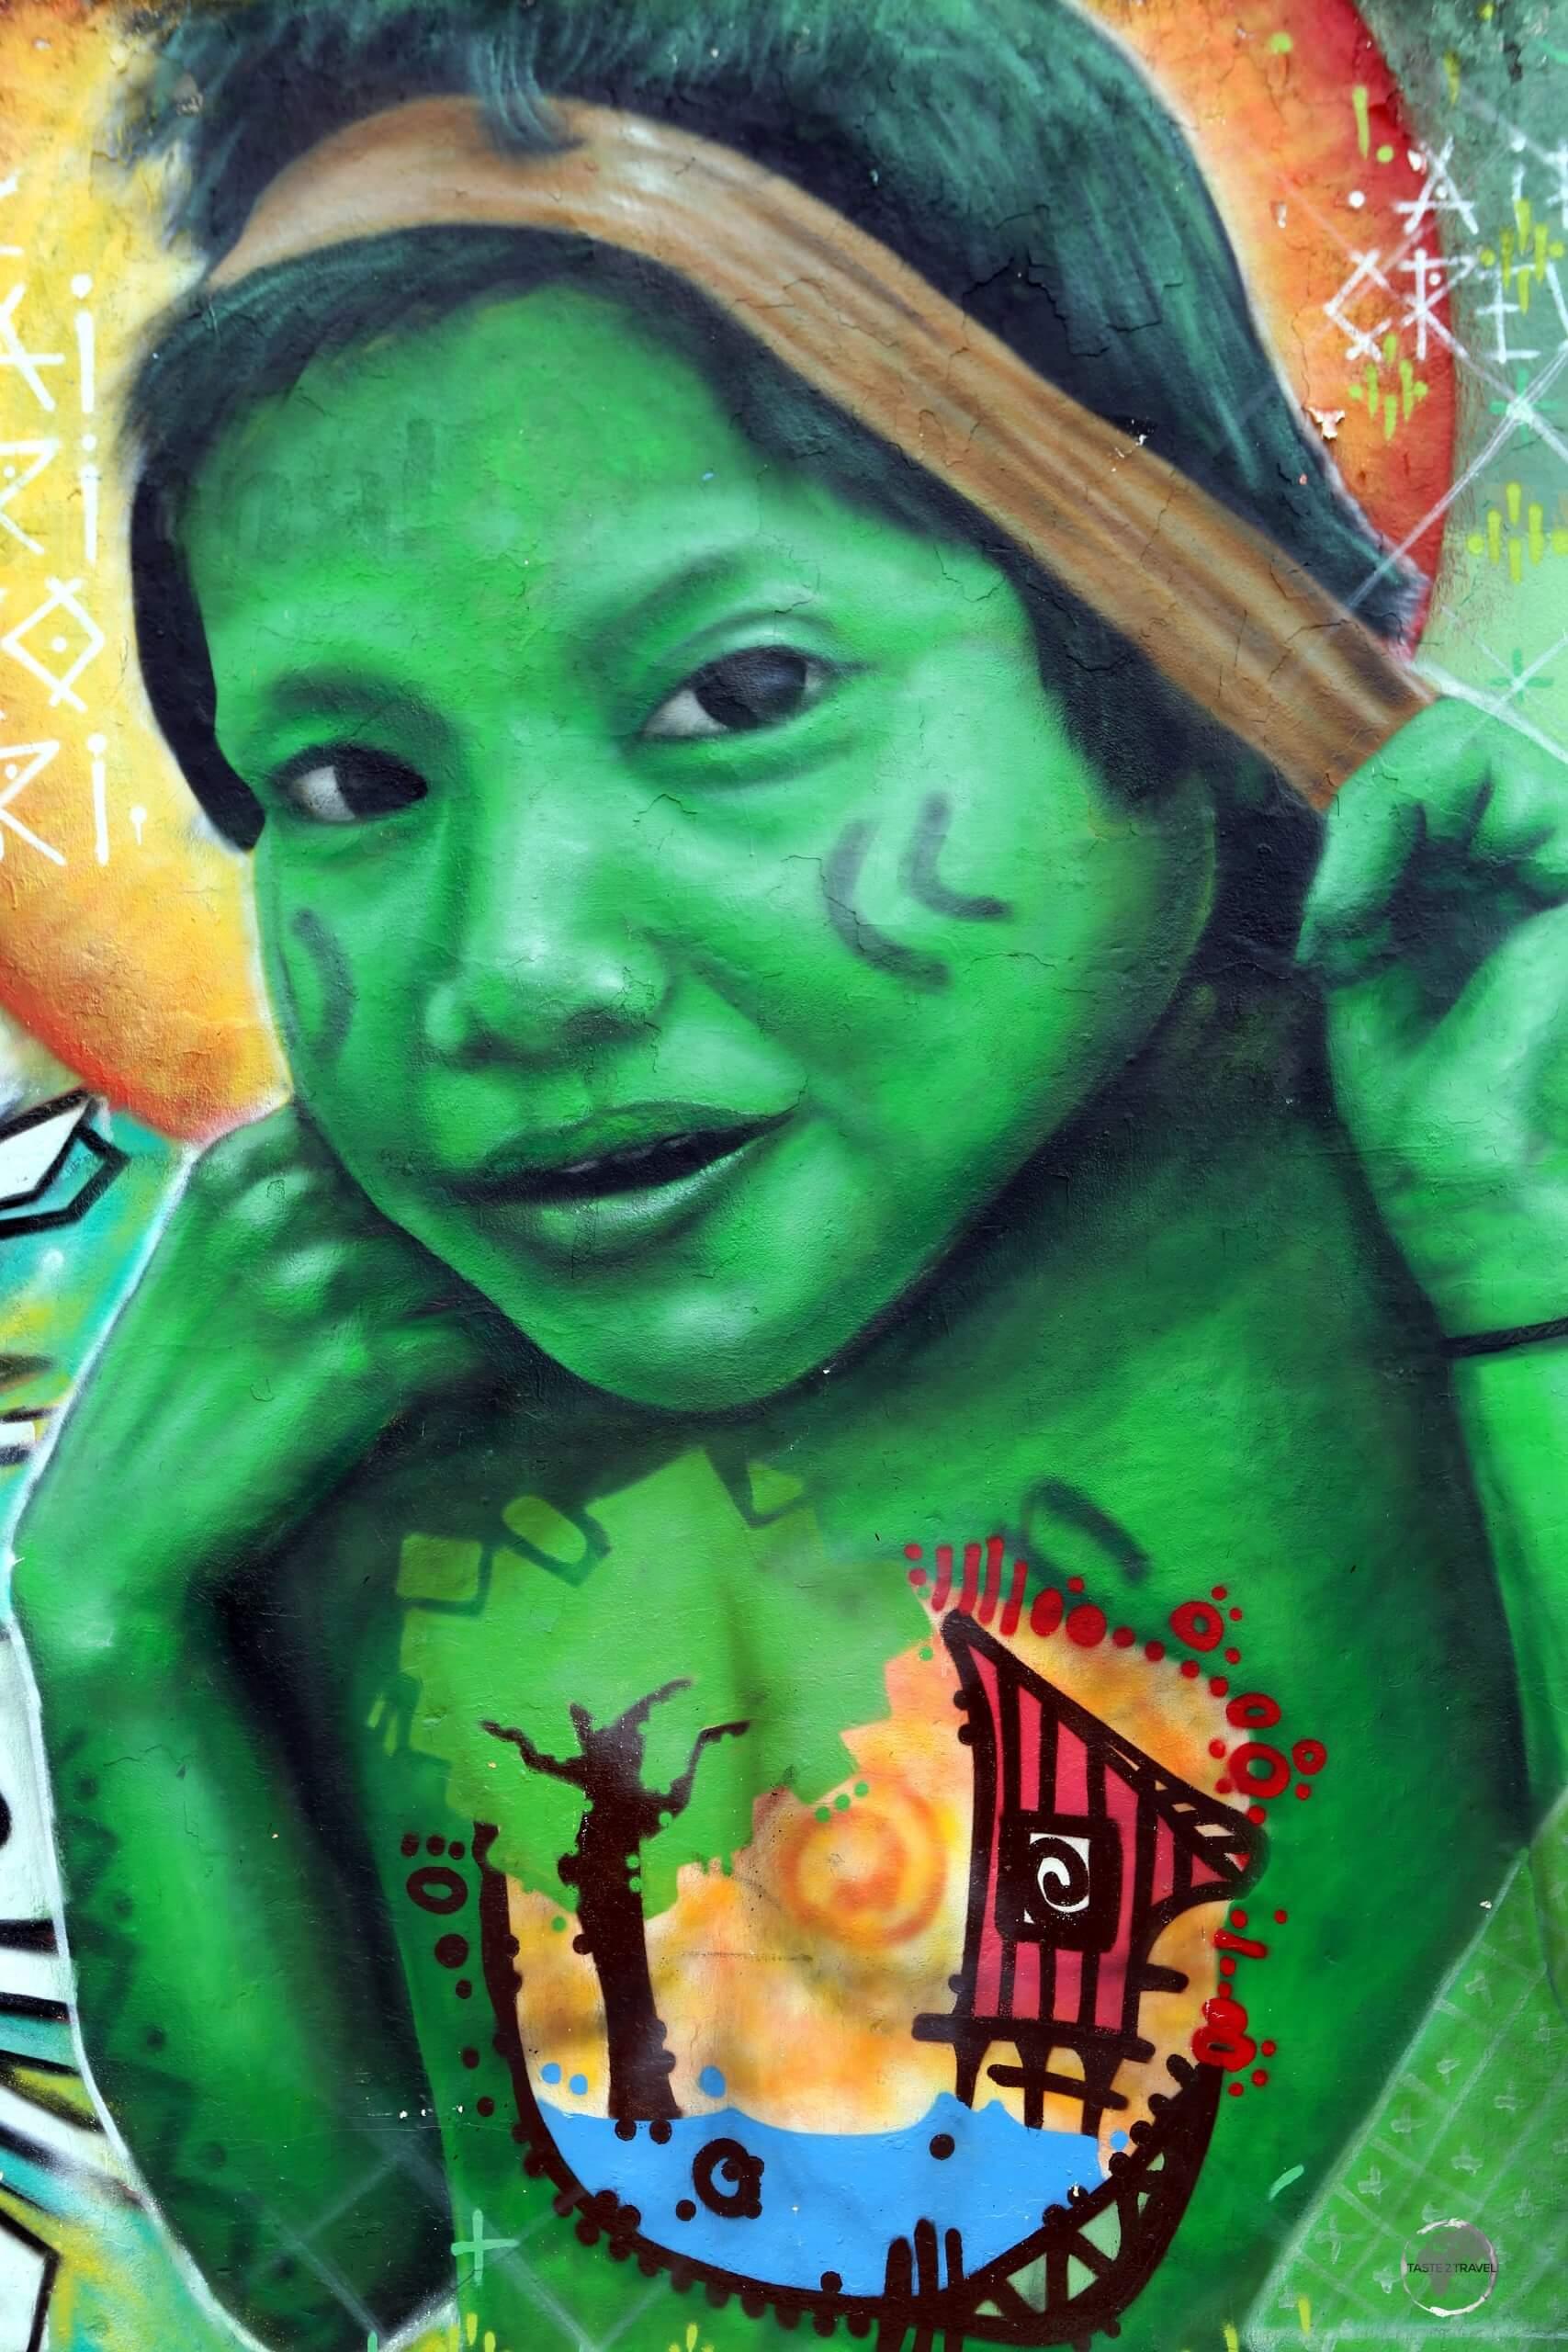 Street art in Manaus, the capital of the vast state of Amazonas, Brazil.